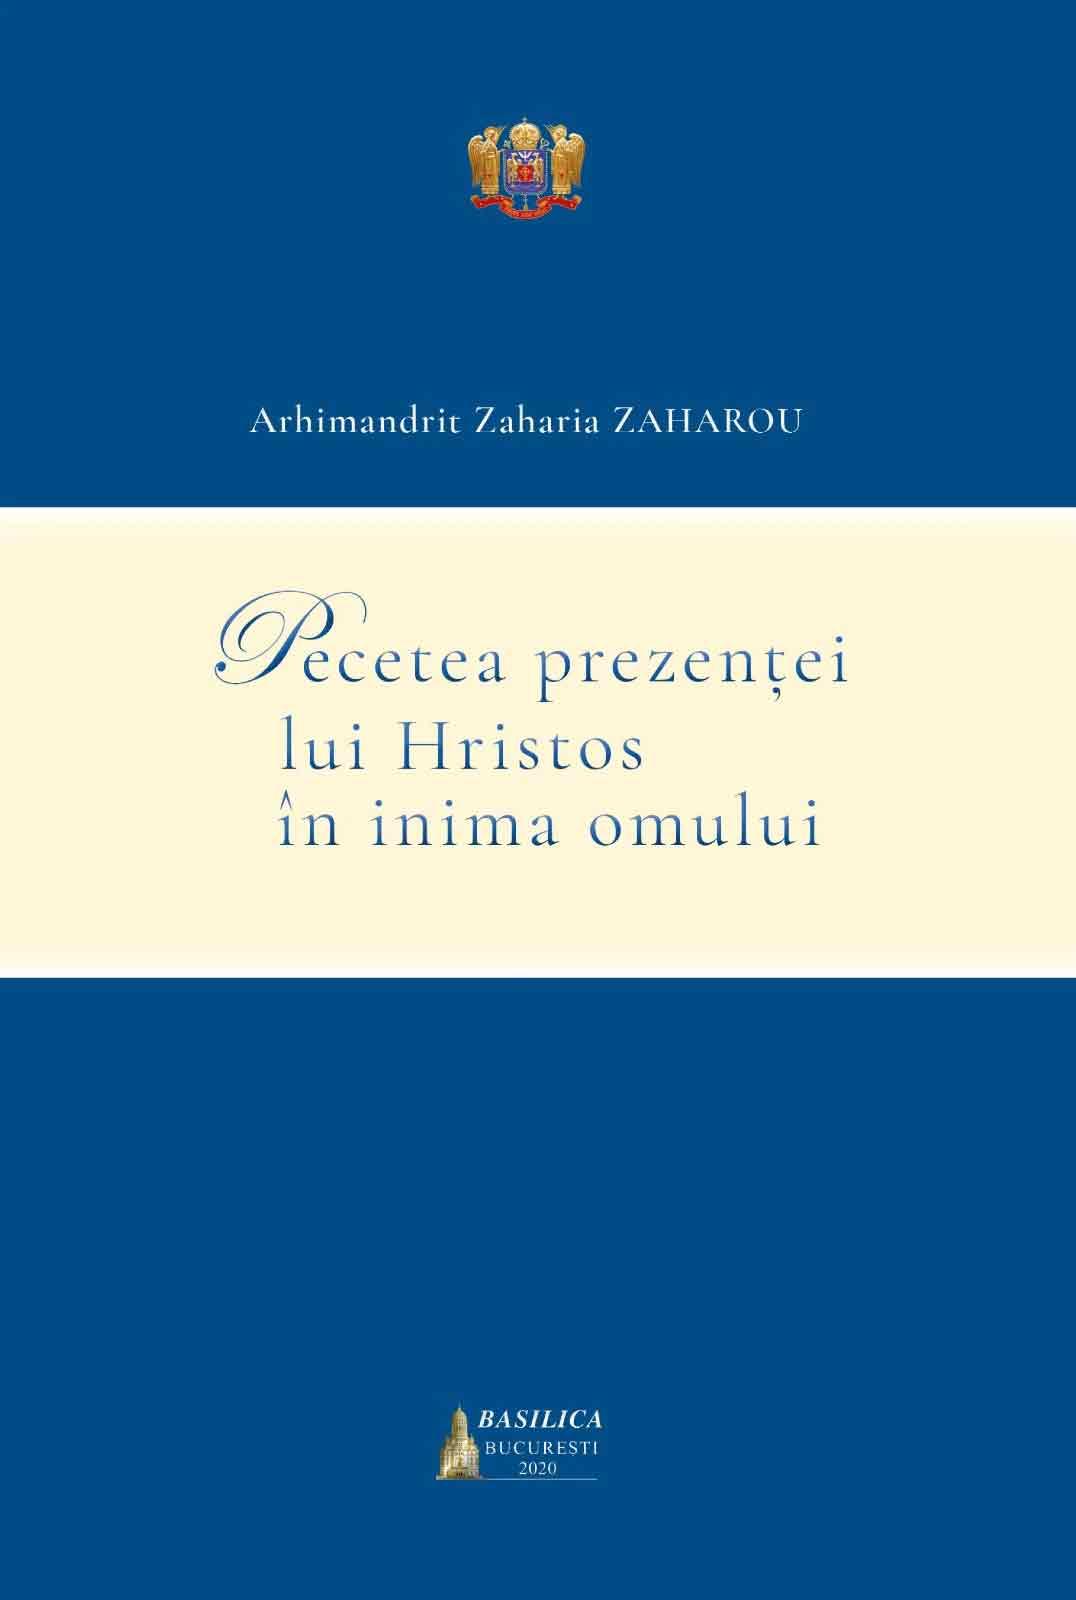 Arhimandrit Zaharia ZAHAROU - Pecetea prezentei lui Hristos in inima omului